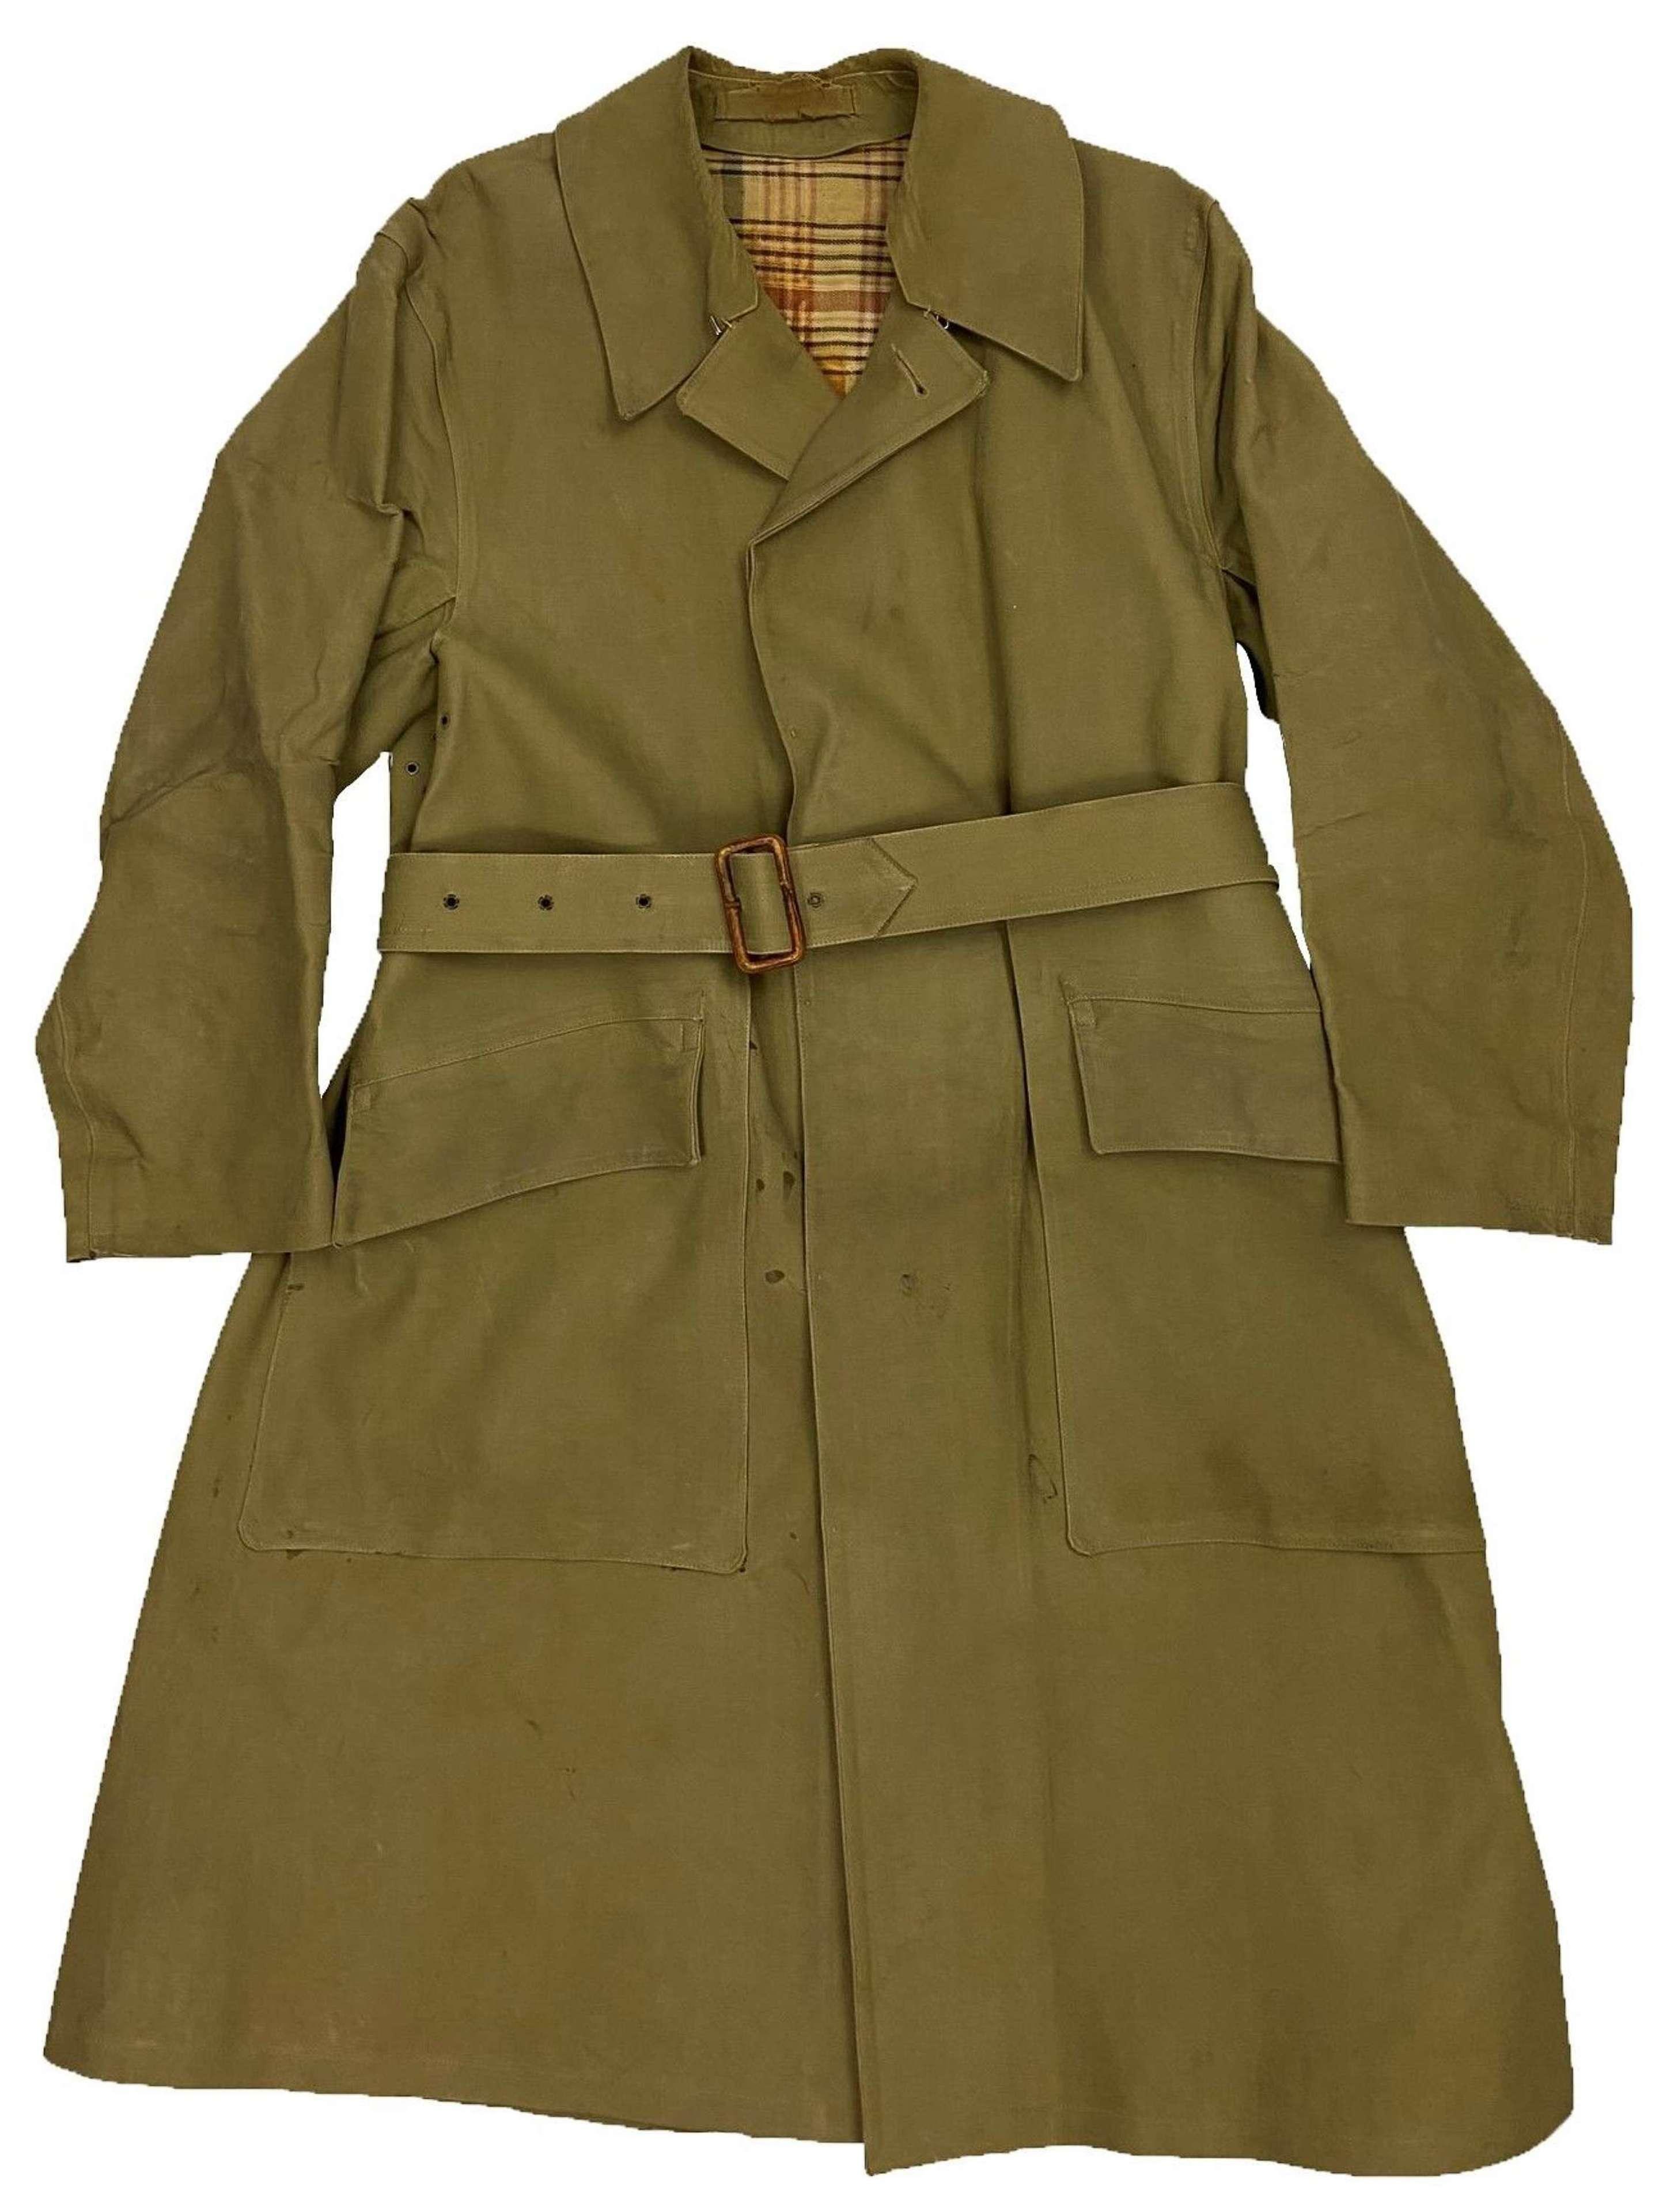 Original 1952 Pattern British Army Officers Macintosh Raincoat  Size S